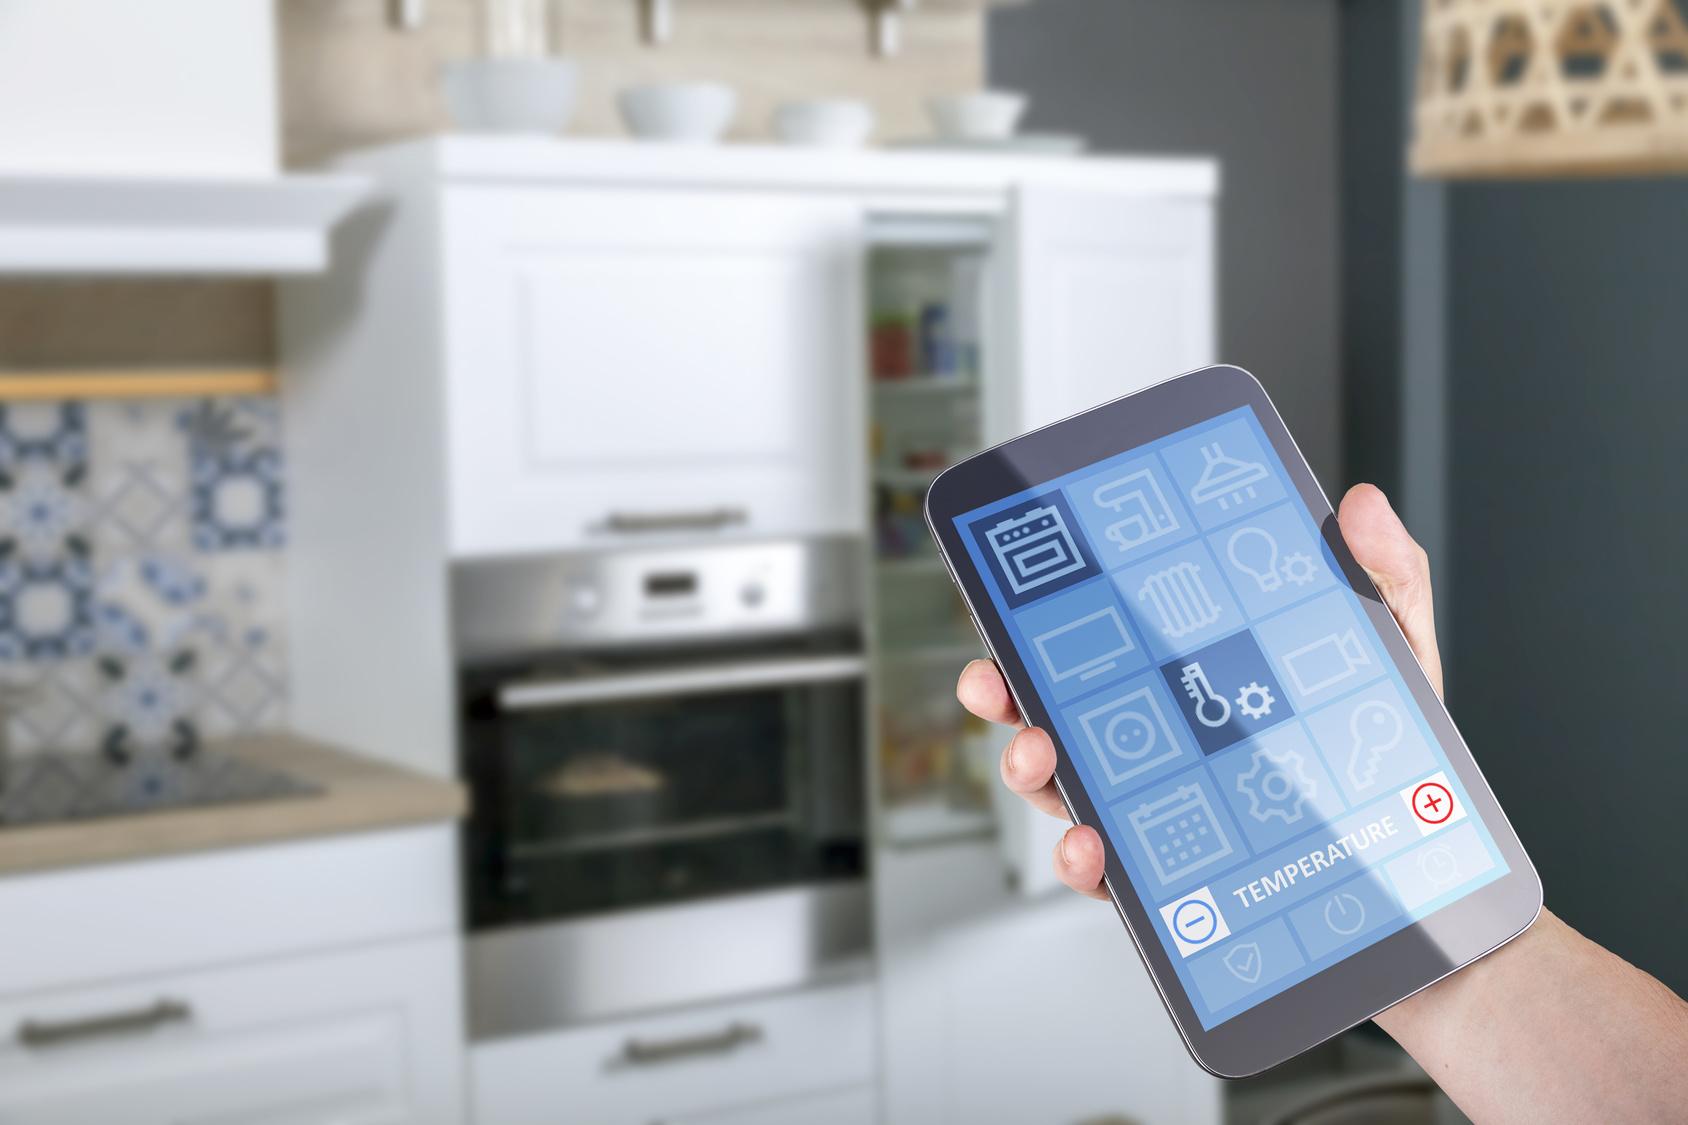 Mit Smart-Home-Technik den Energiebedarf drosseln Bild: Fotolia, © Herrndorff